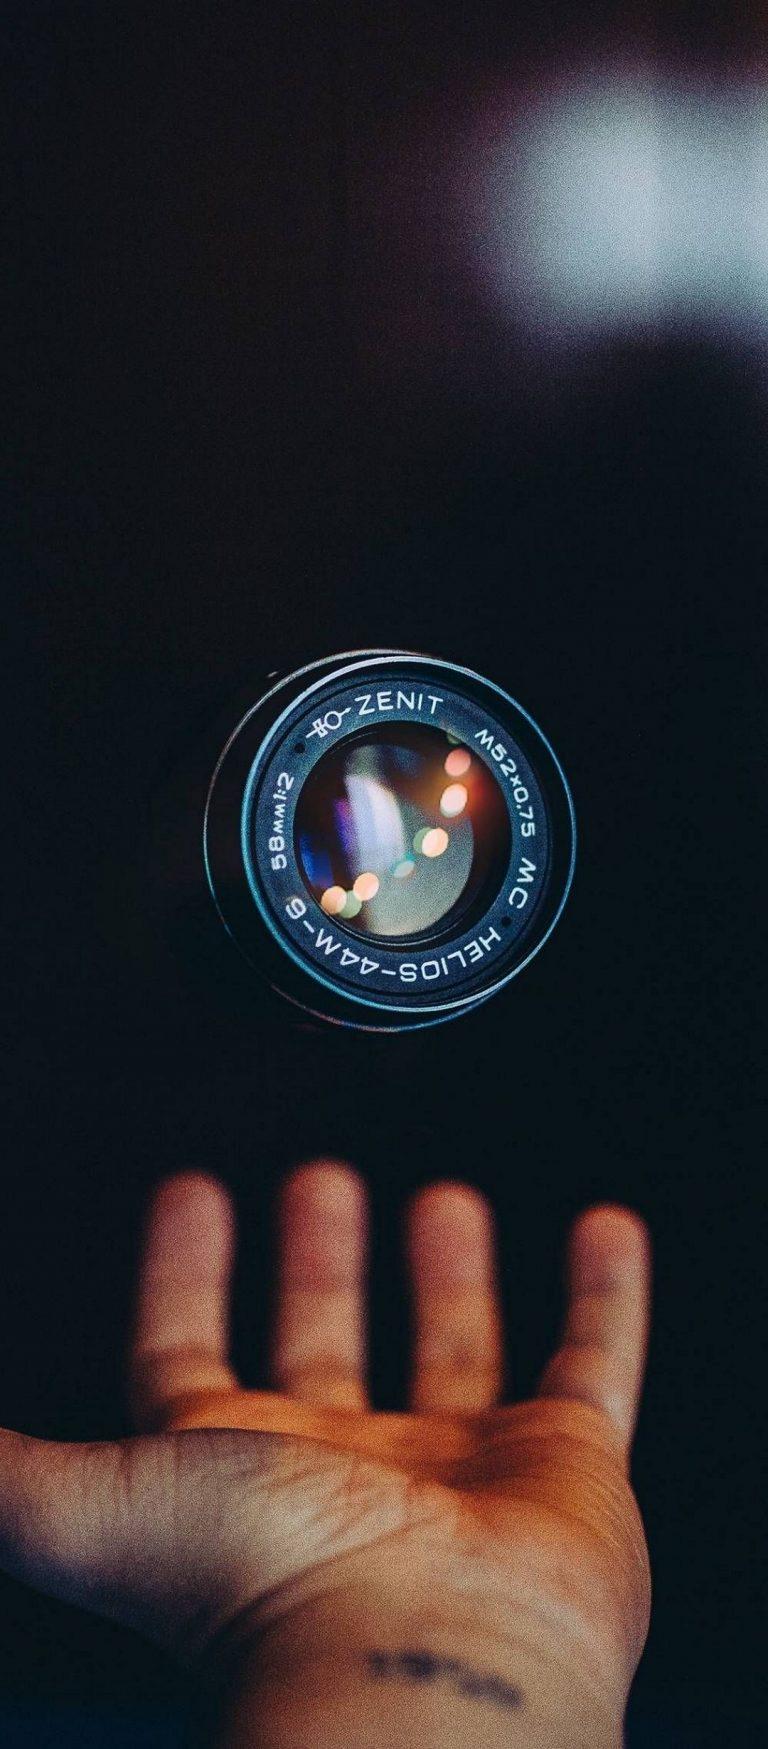 Lens Hand Camera Technology 1080x2460 768x1749